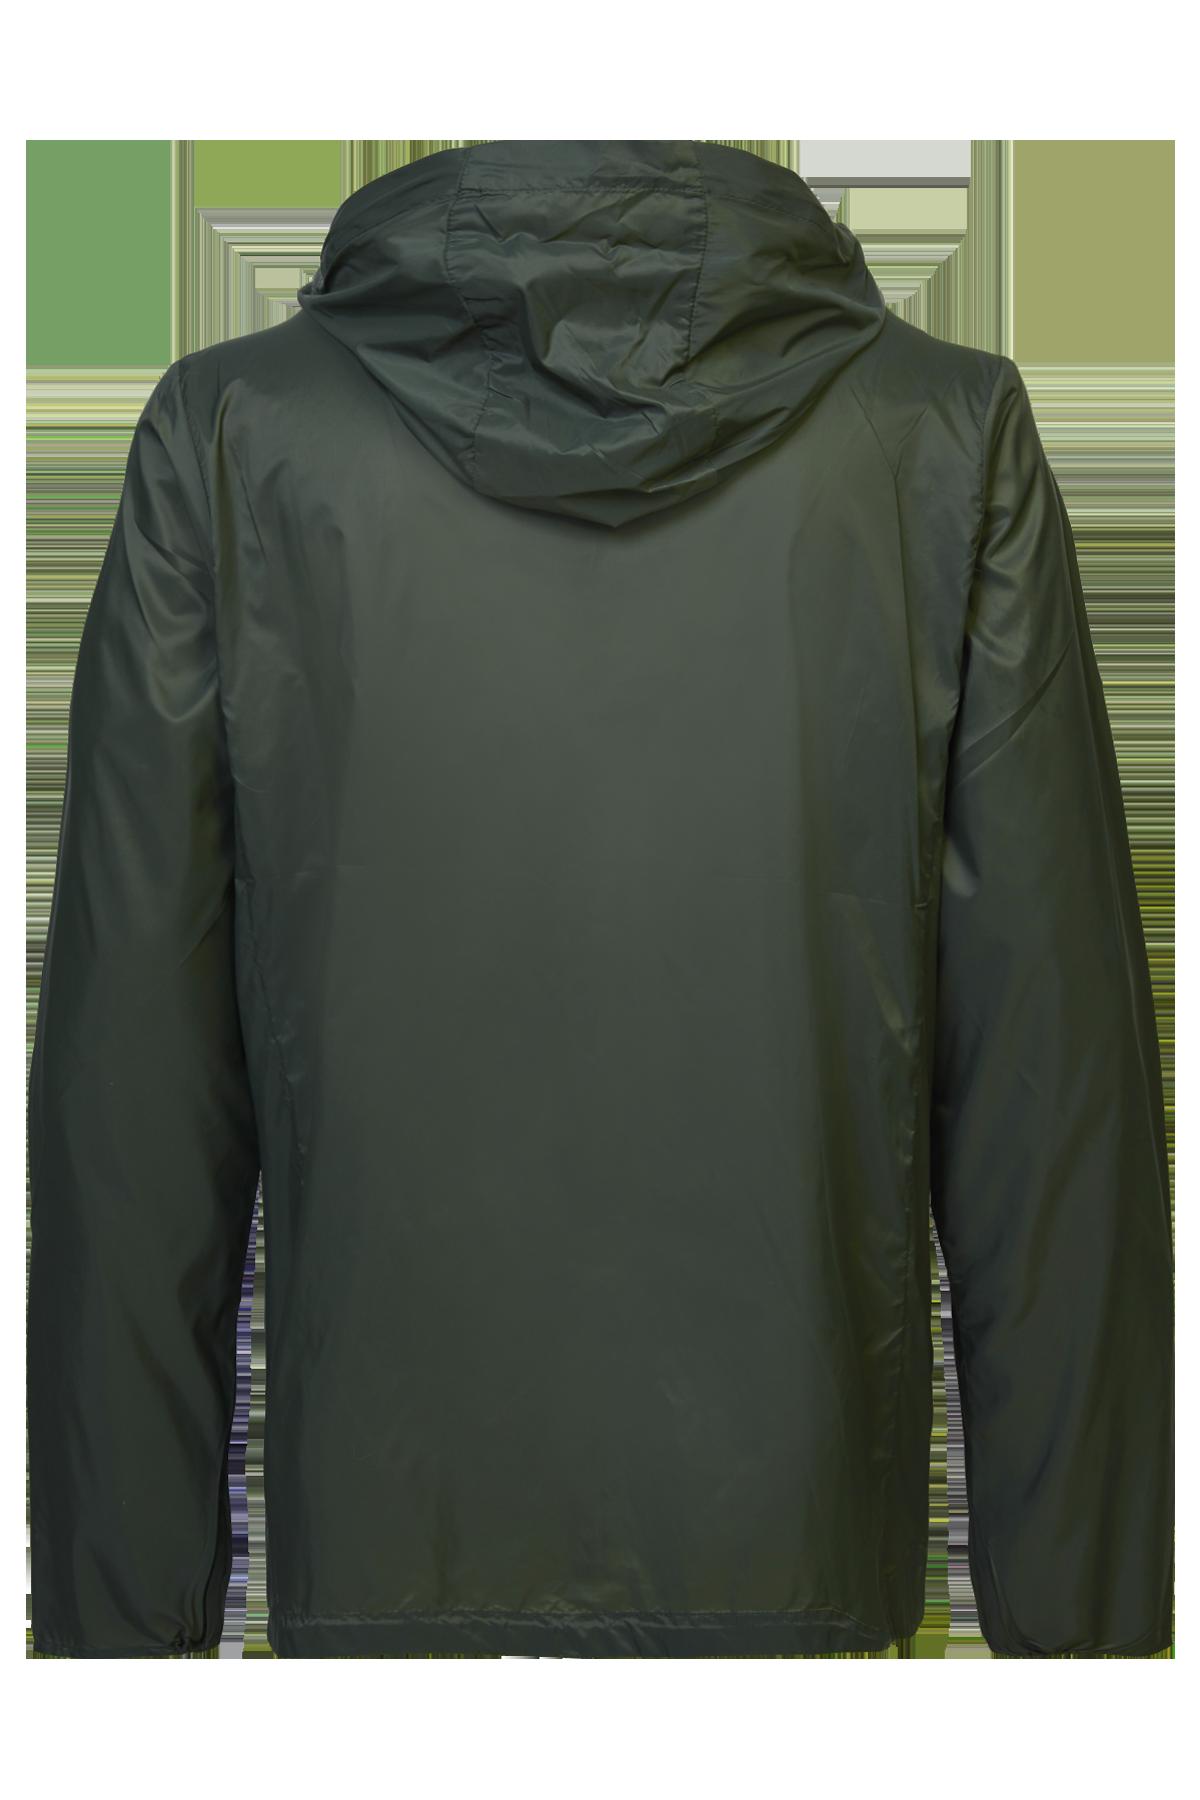 Jacket Pestival jacket